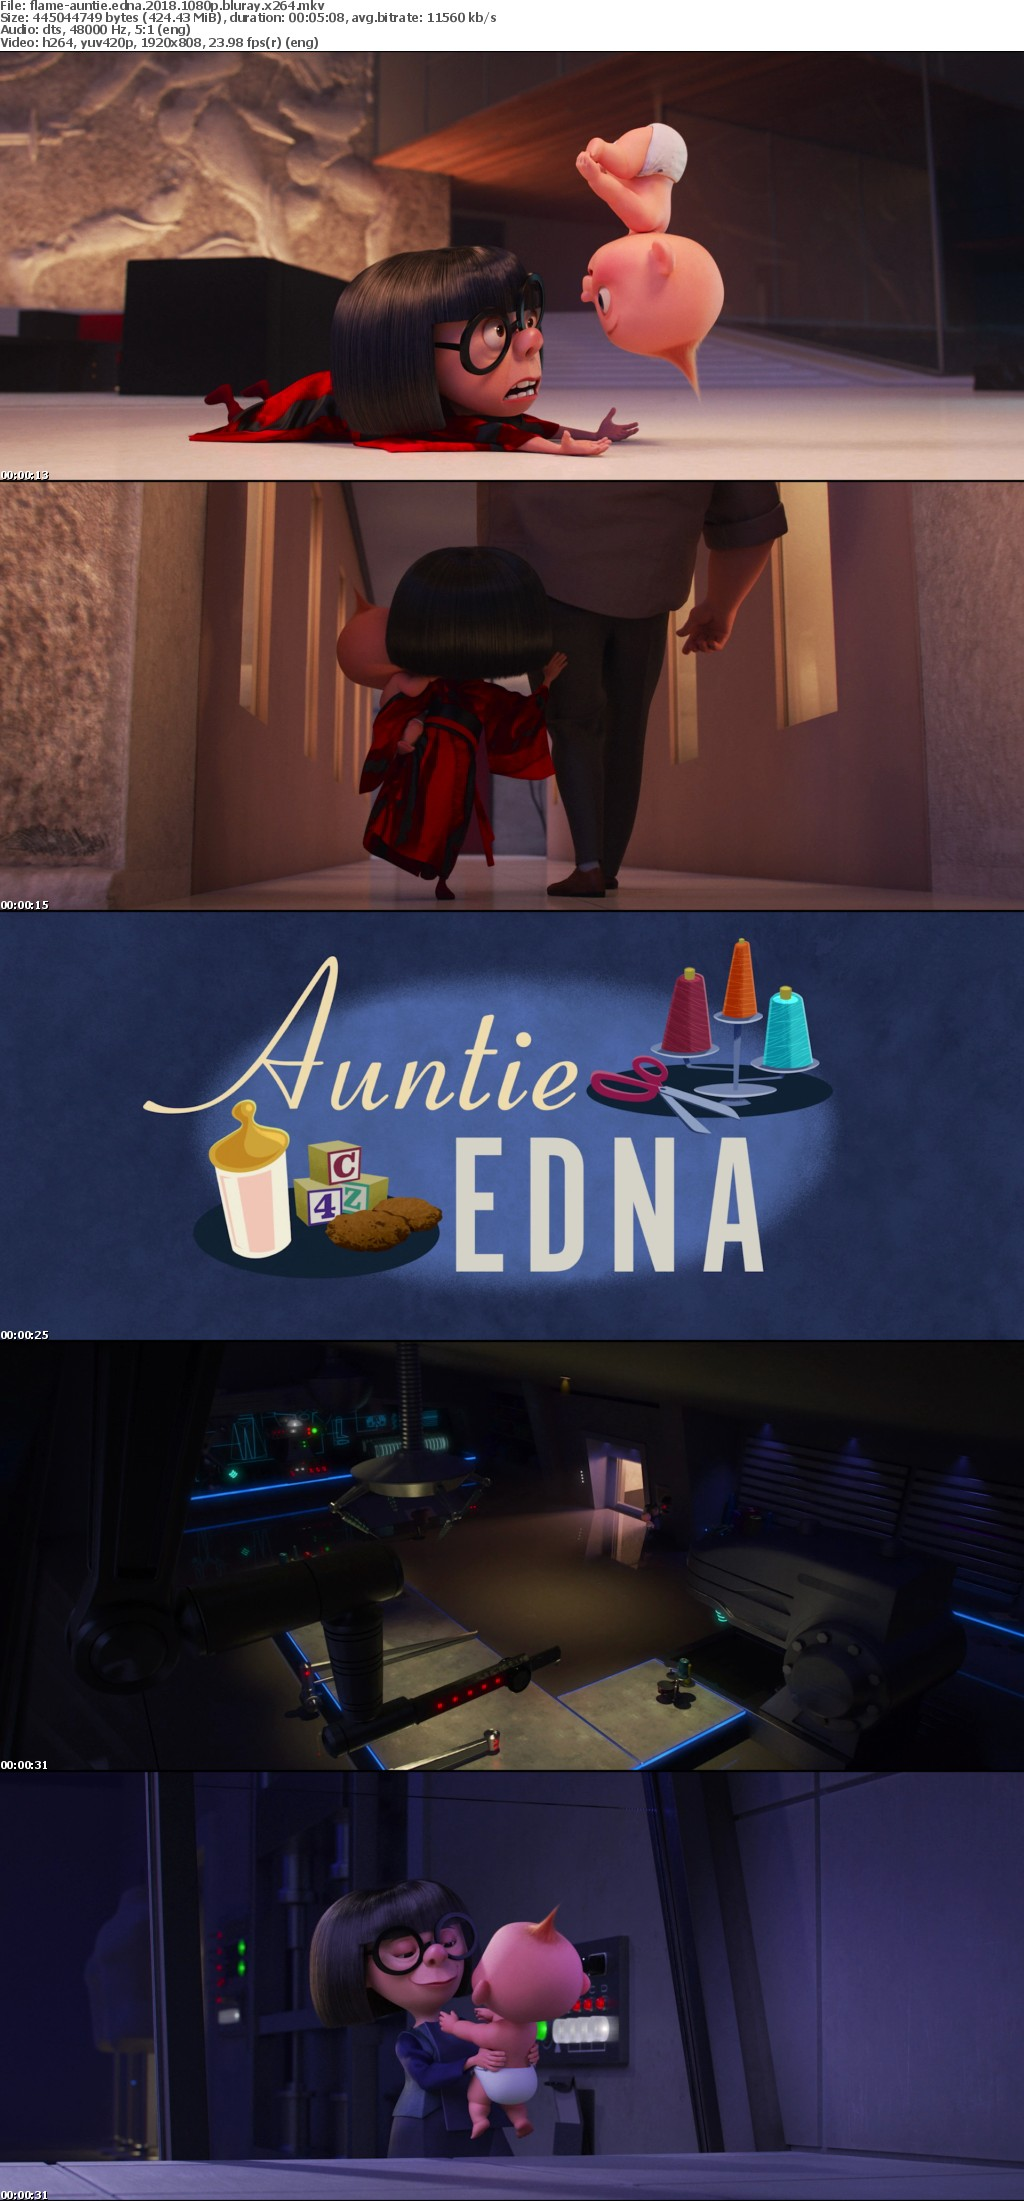 Auntie Edna 2018 1080p BluRay x264-FLAME